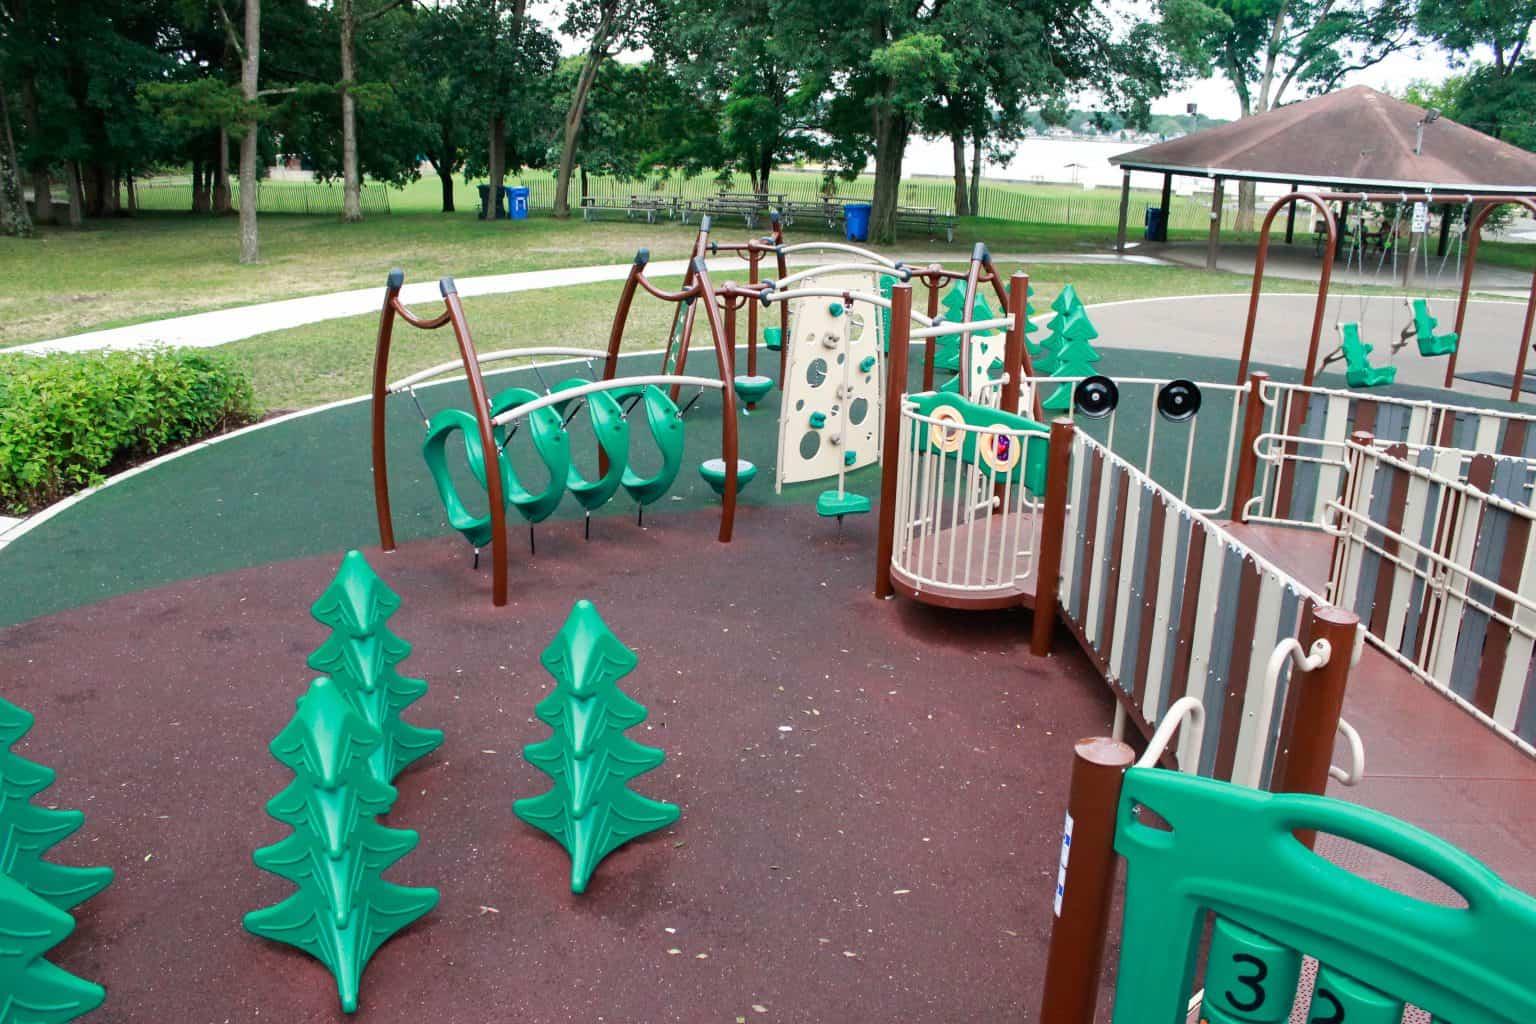 windward-beach-park-playground-brick-nj_27651268794_o-1-1536x1024